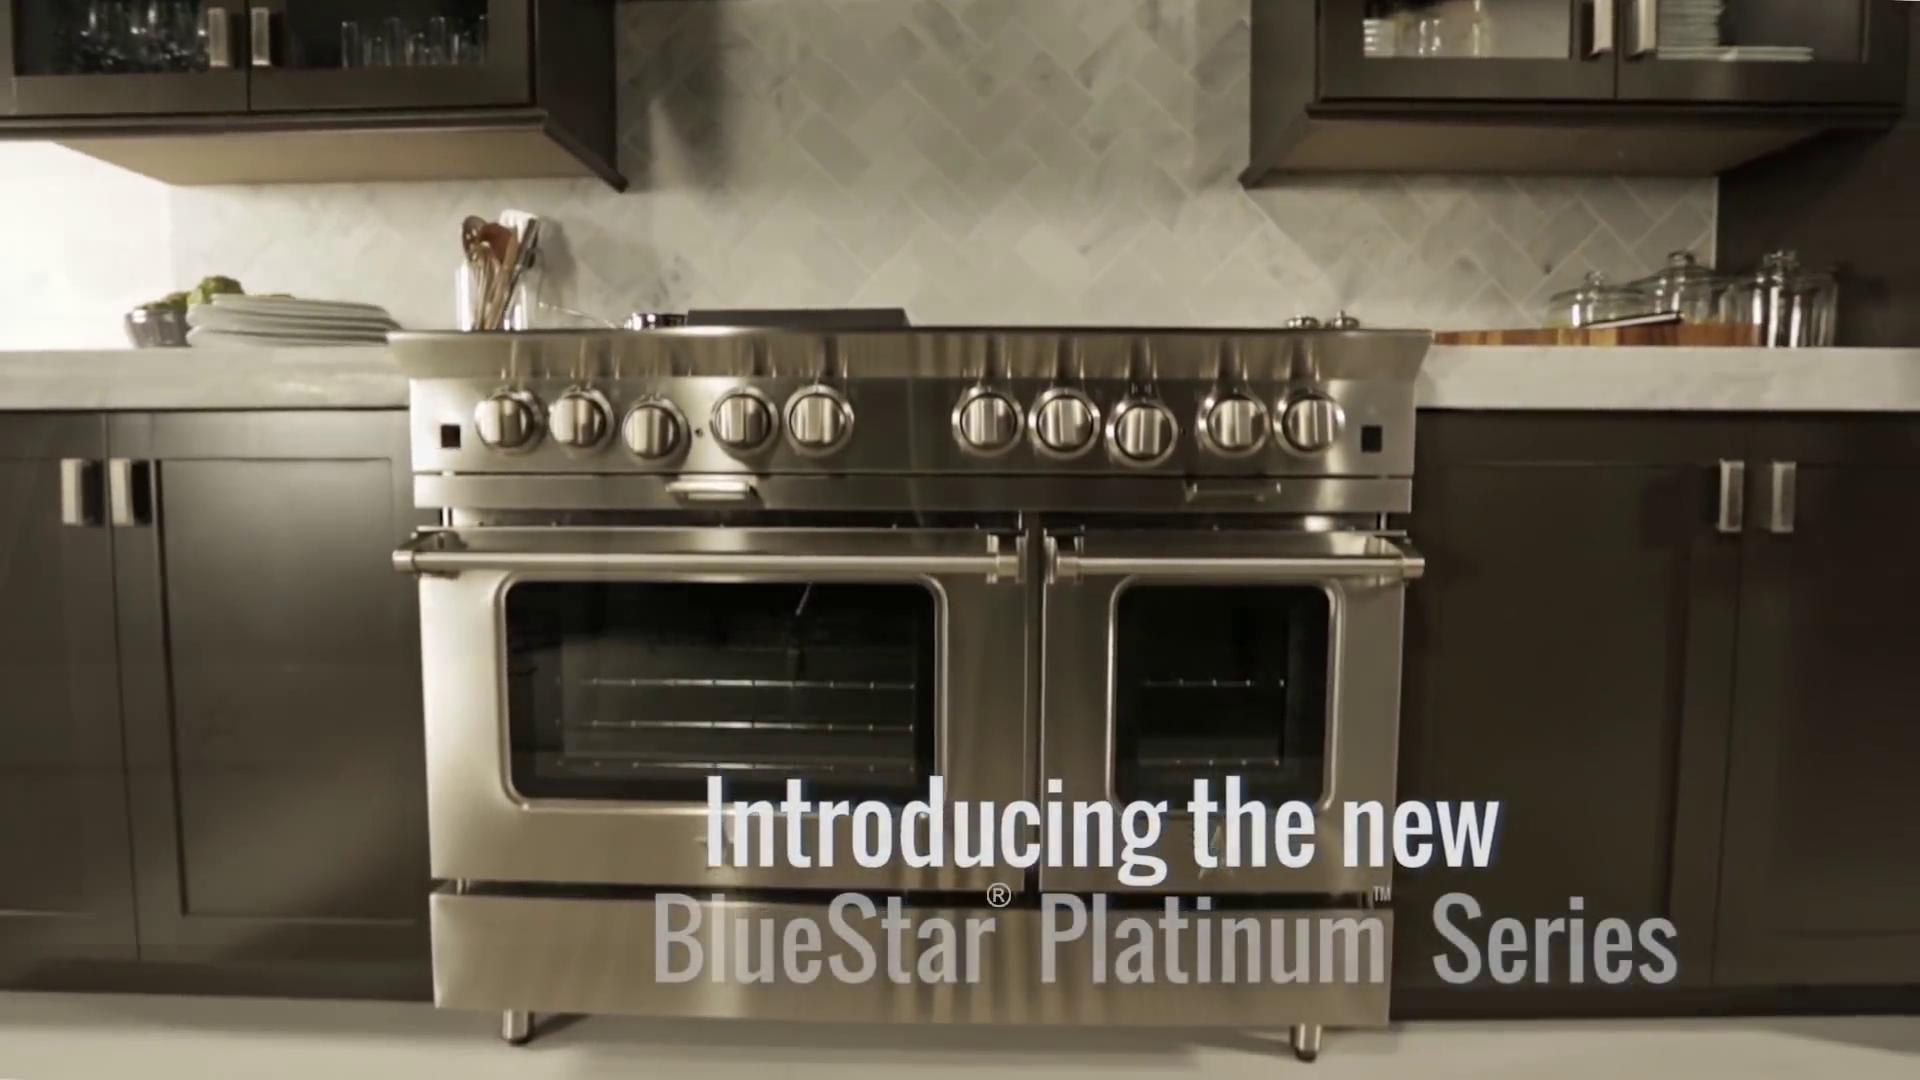 BlueStar: Platinum Series